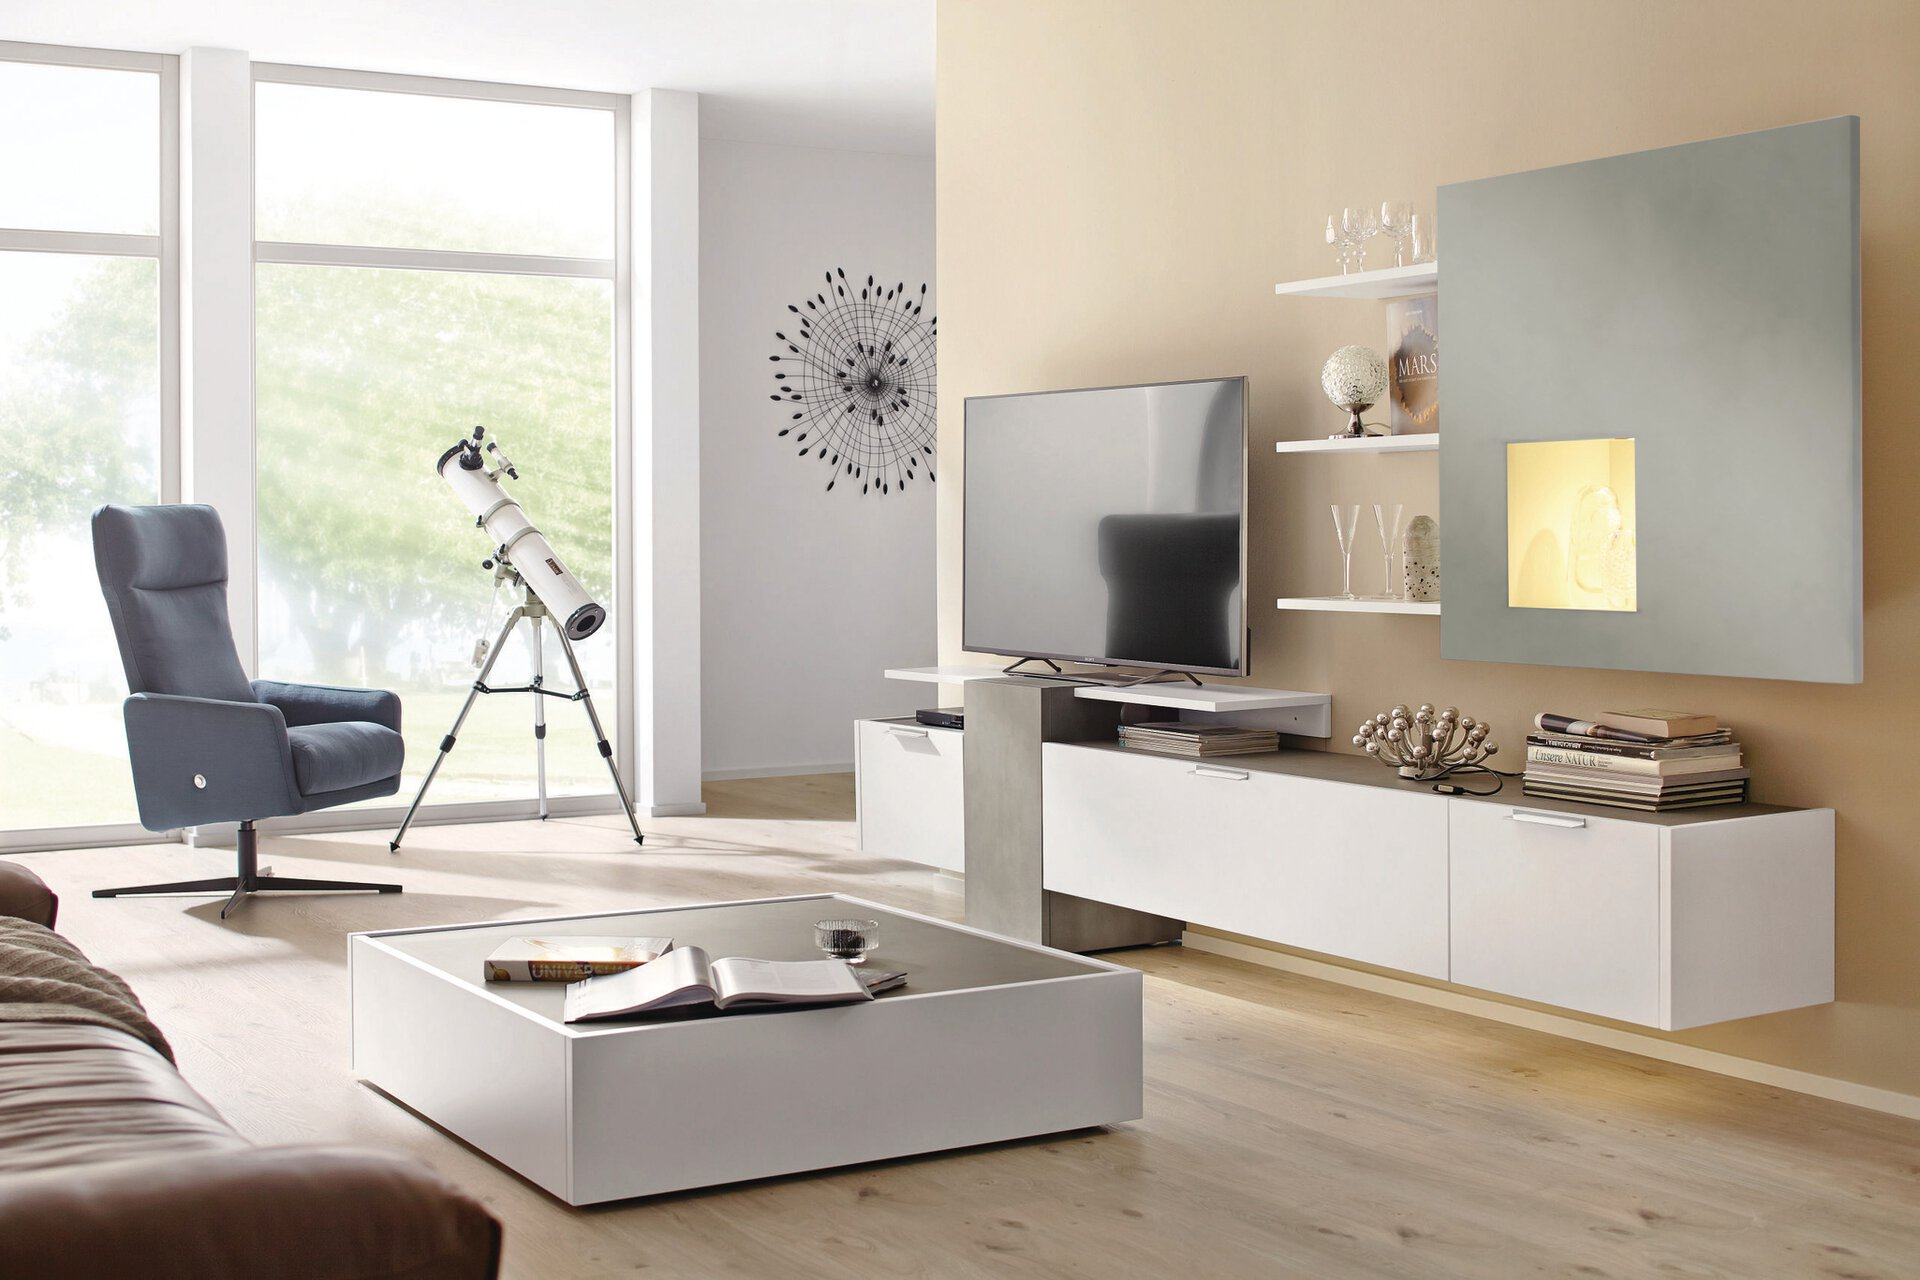 Wohnwand FENA Hülsta Holzwerkstoff weiß 45 x 185 x 330 cm